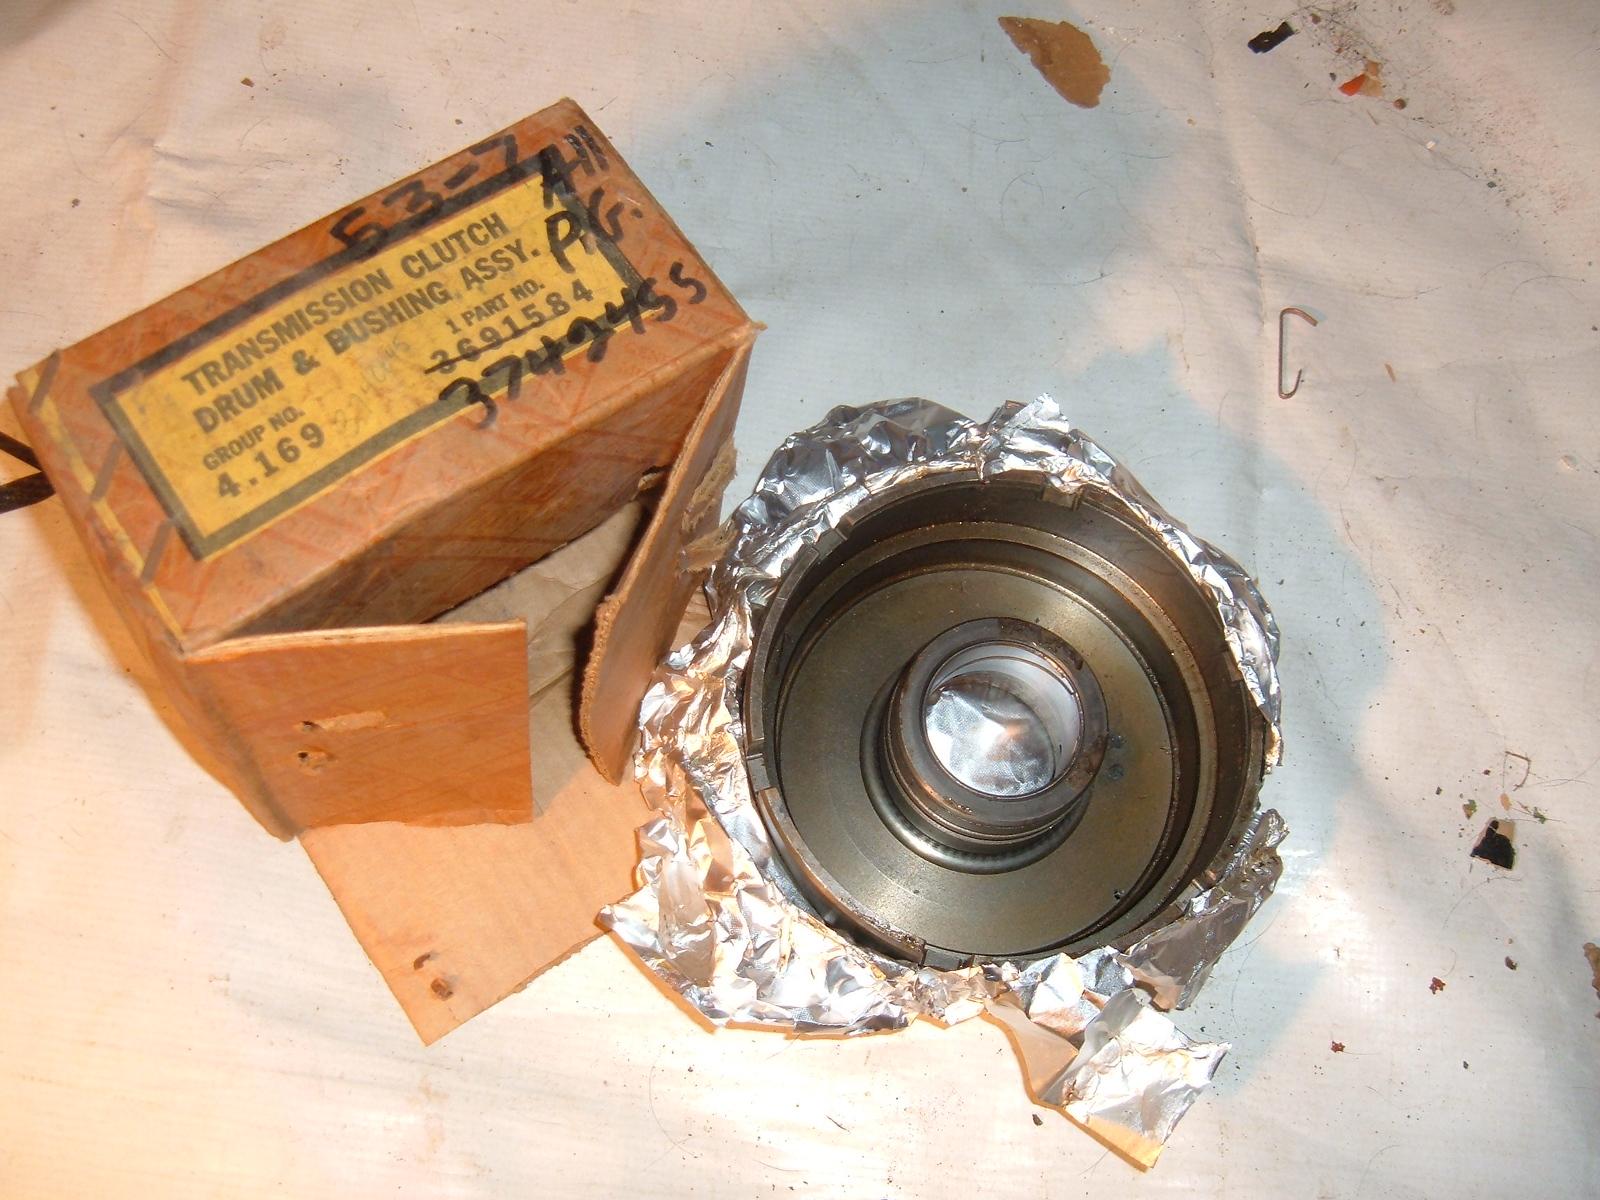 1953 54 55 56 57 corvette pass transmission clutch drum assy nos gm 3742455 (z 3742455)